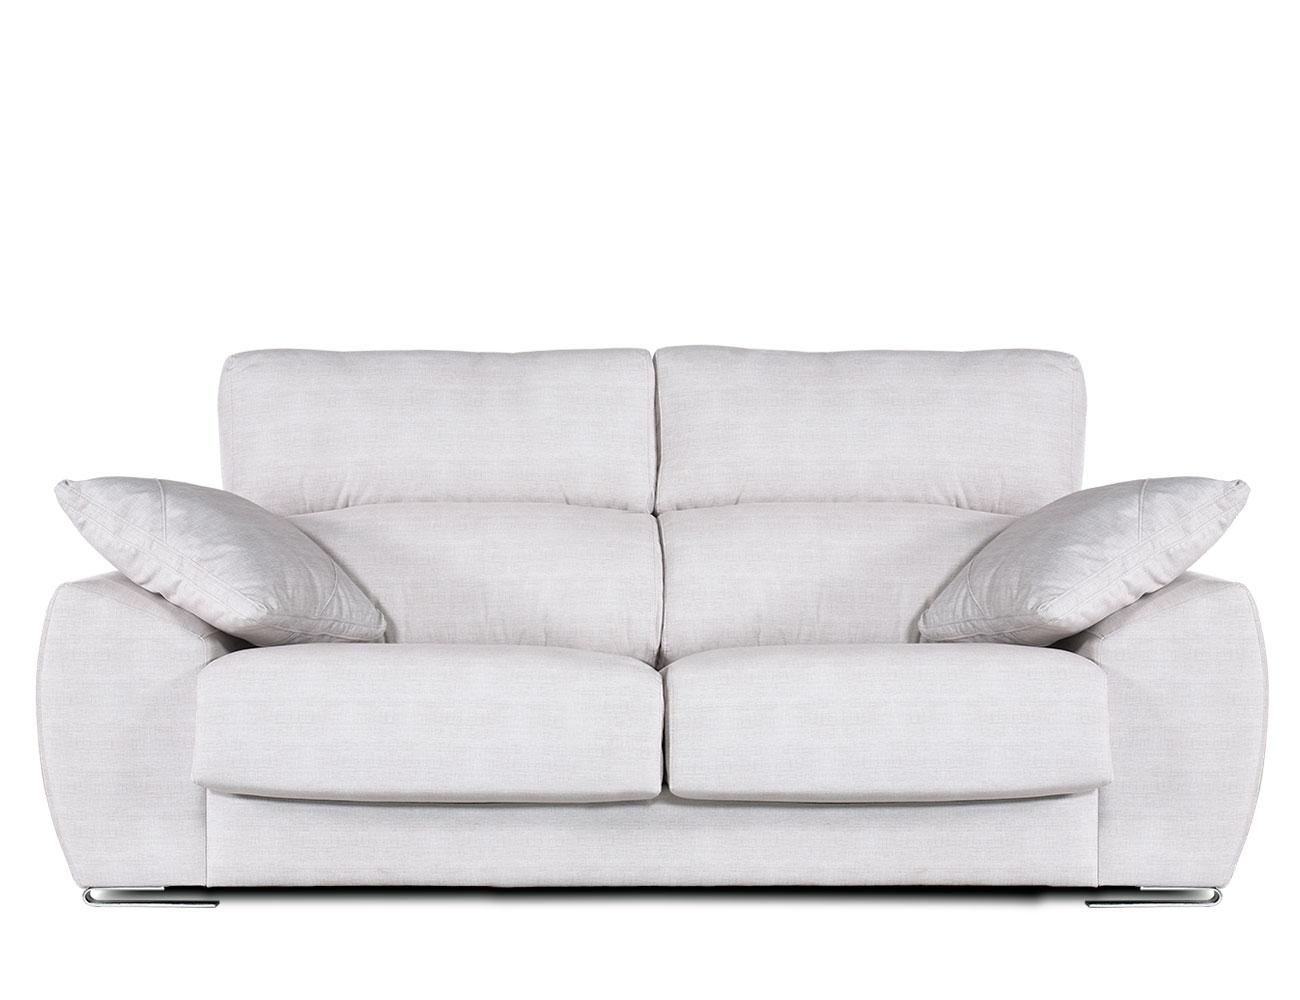 Sofa moderno 3plazas4